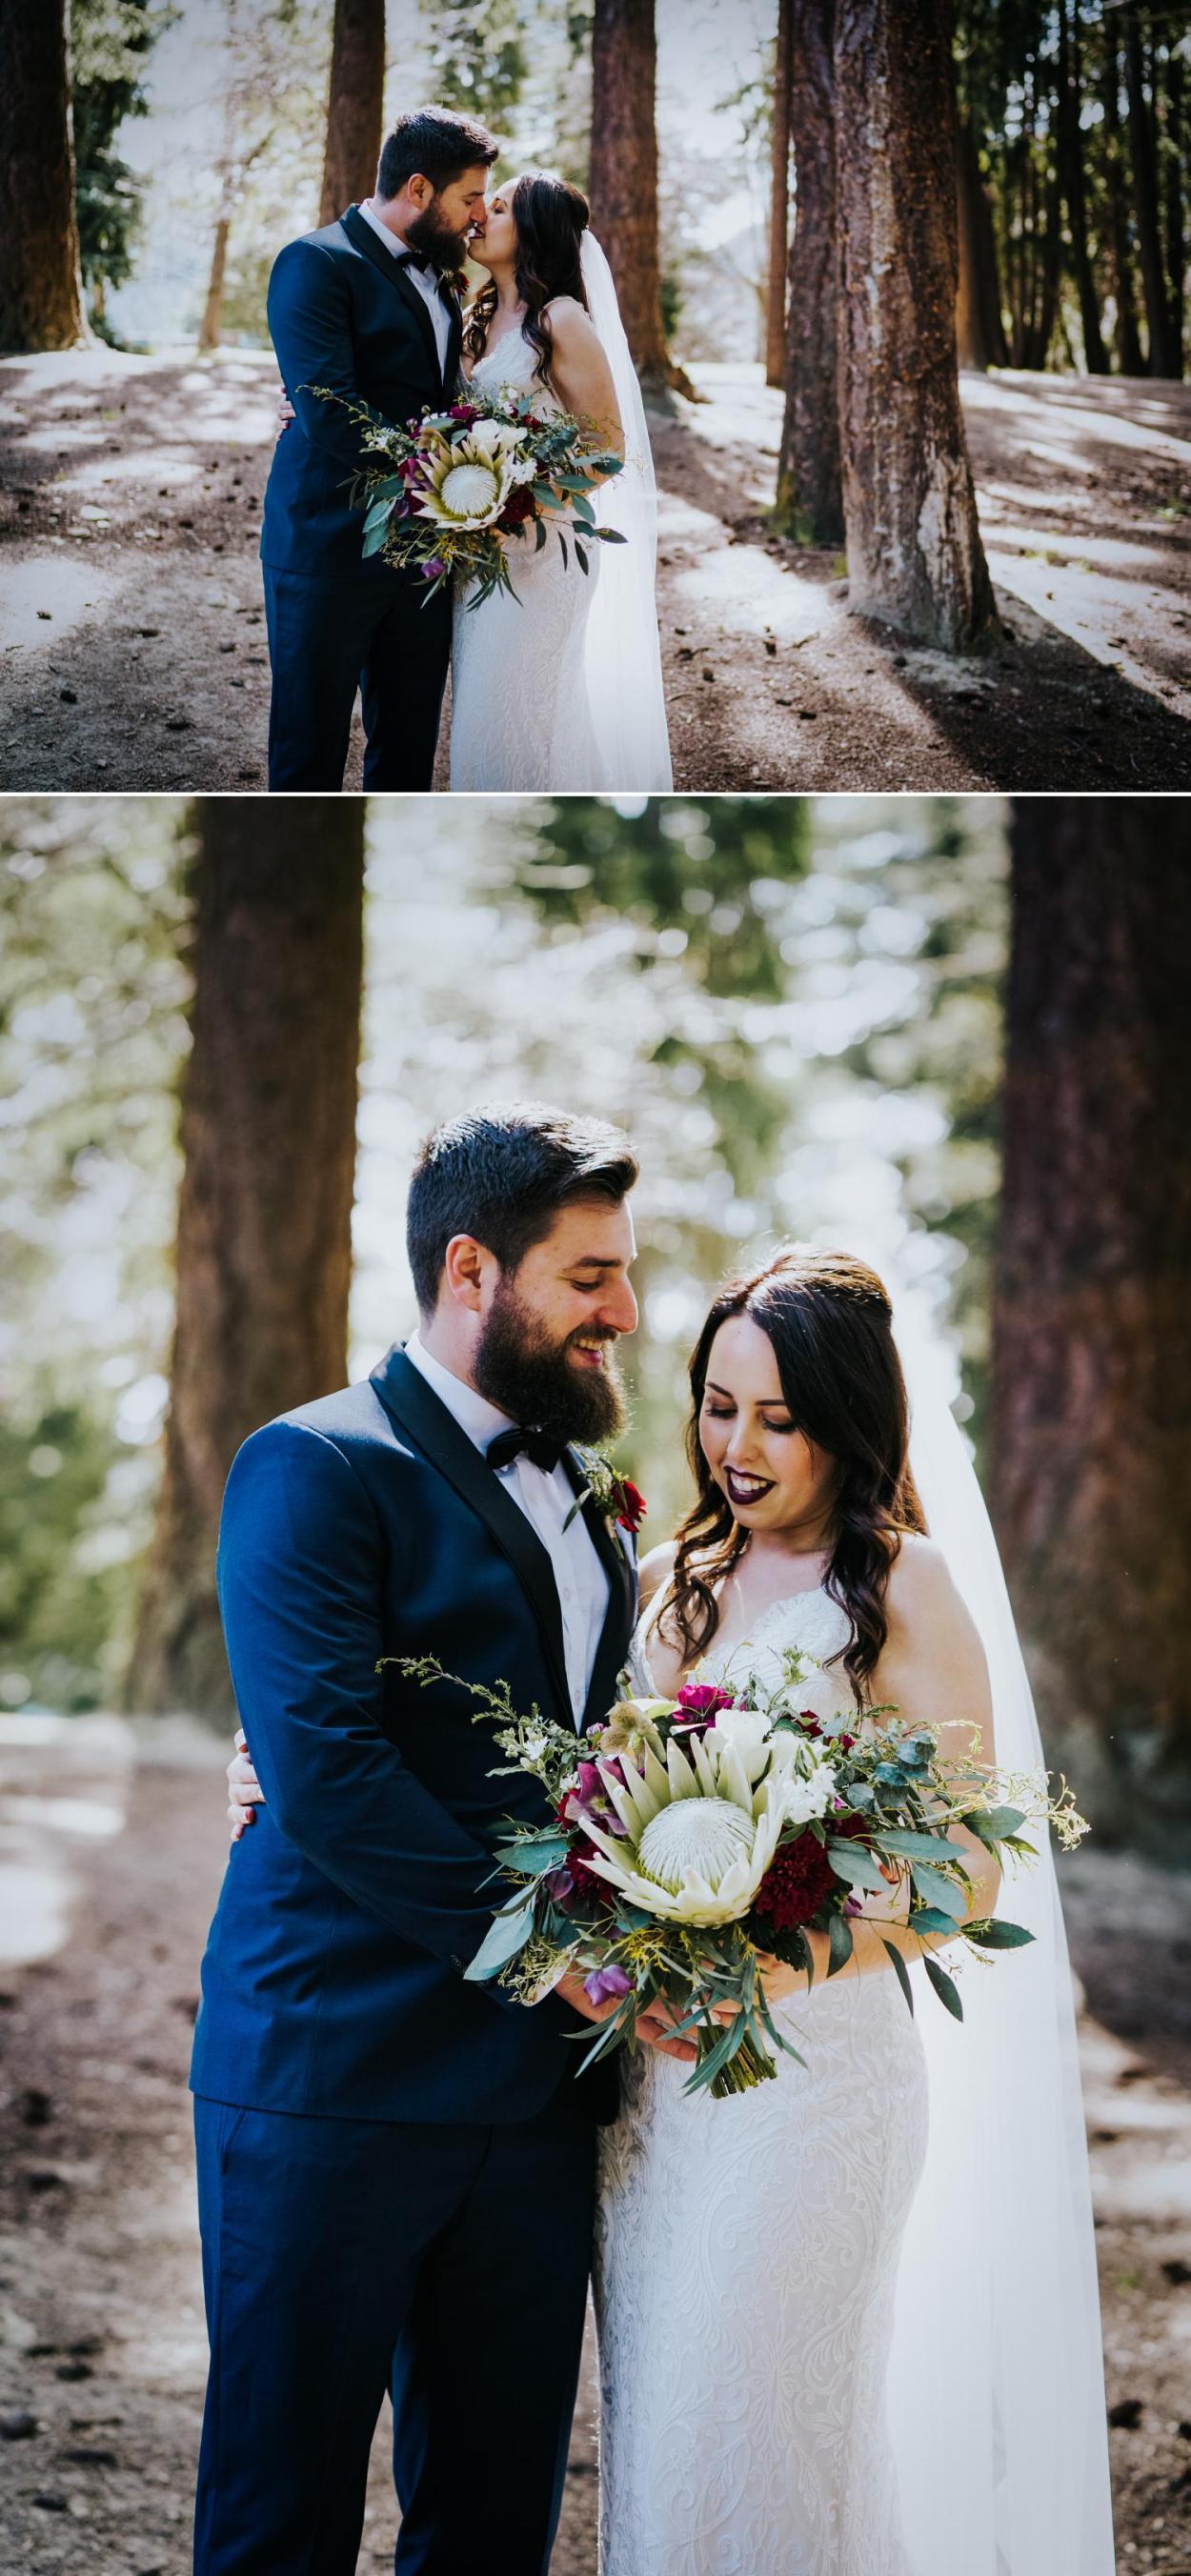 Bride and groom wedding photography new zealand